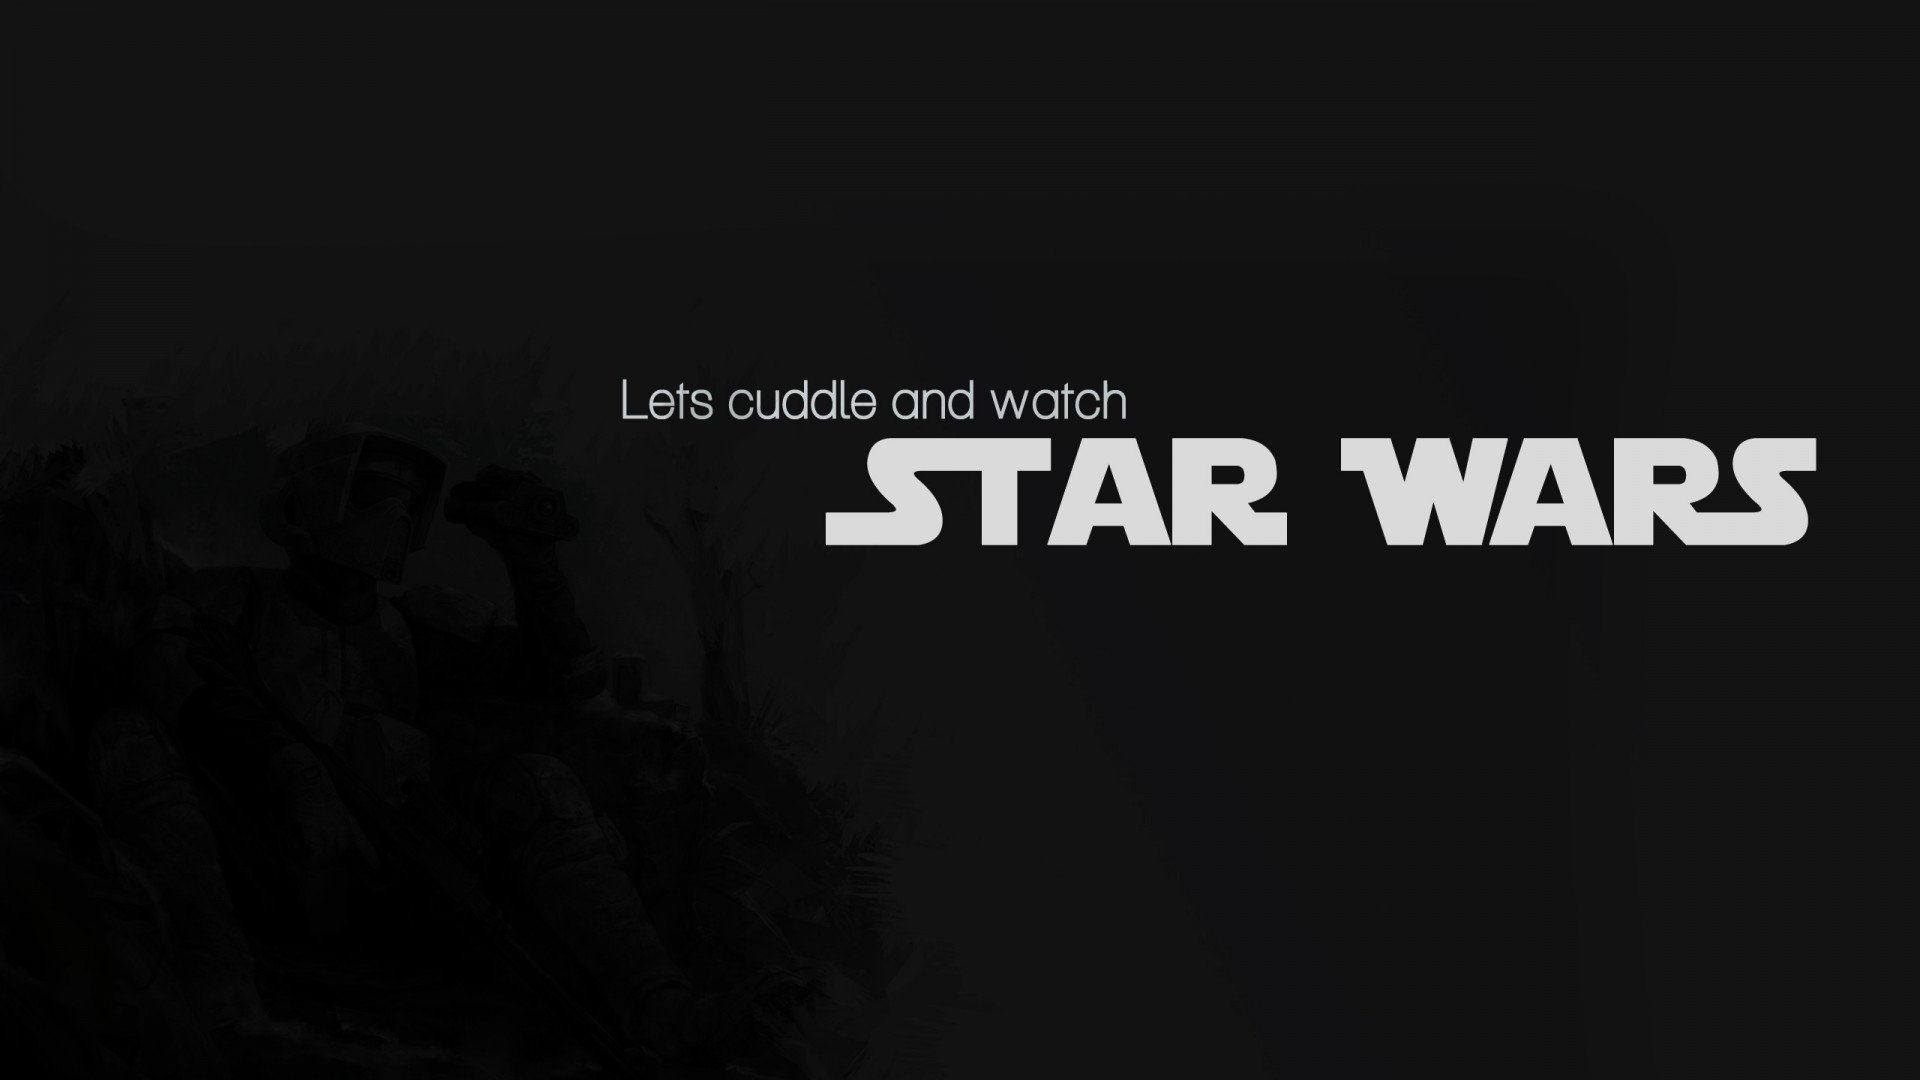 Funny star wars desktop wallpaper hd